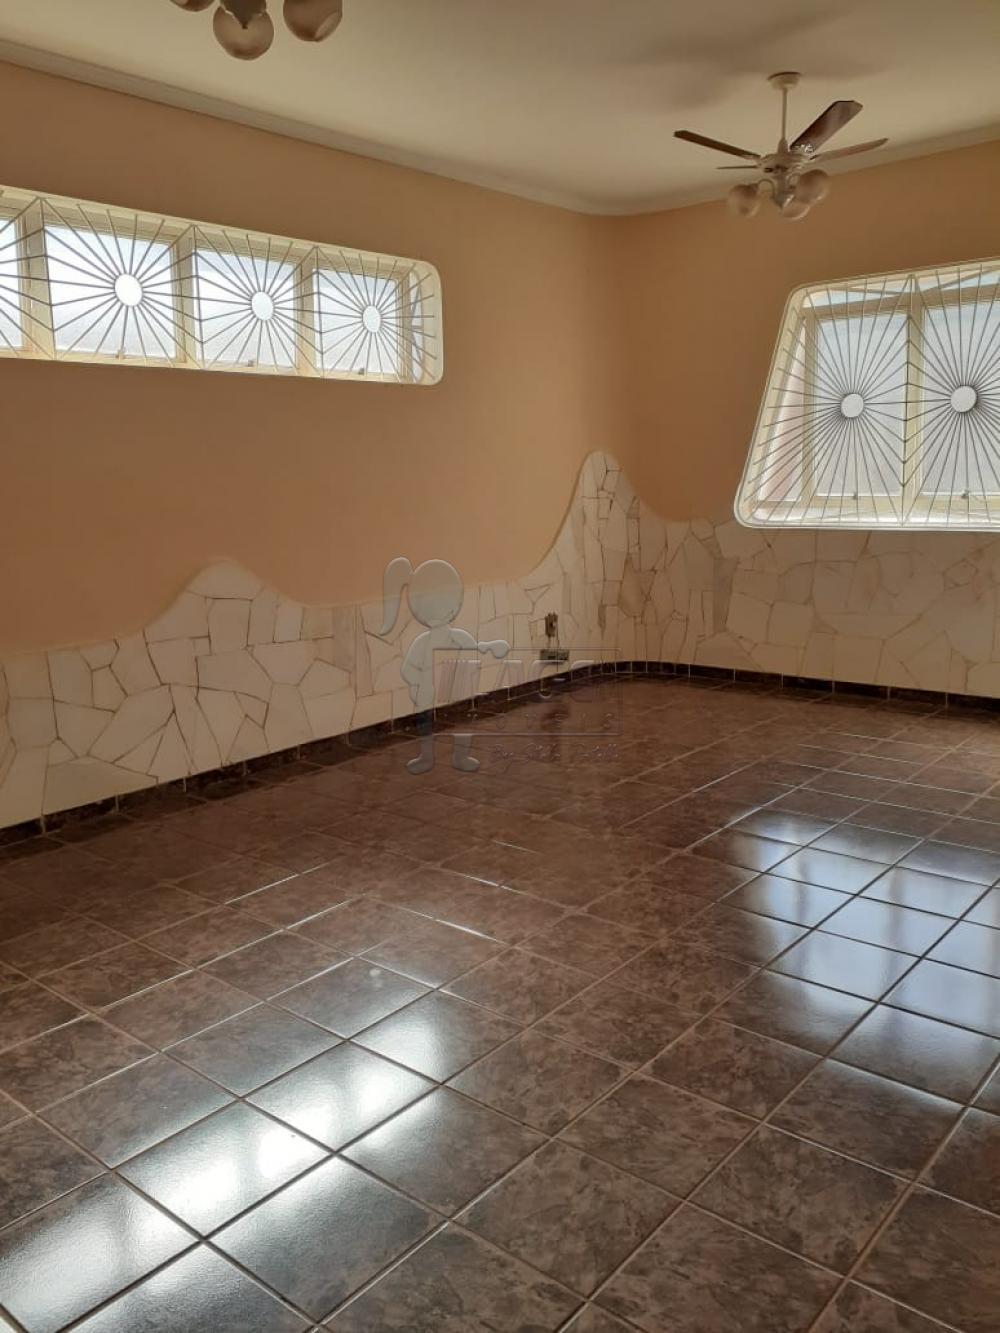 Ribeirao Preto Casa Venda R$840.000,00 3 Dormitorios 2 Suites Area do terreno 437.50m2 Area construida 235.94m2